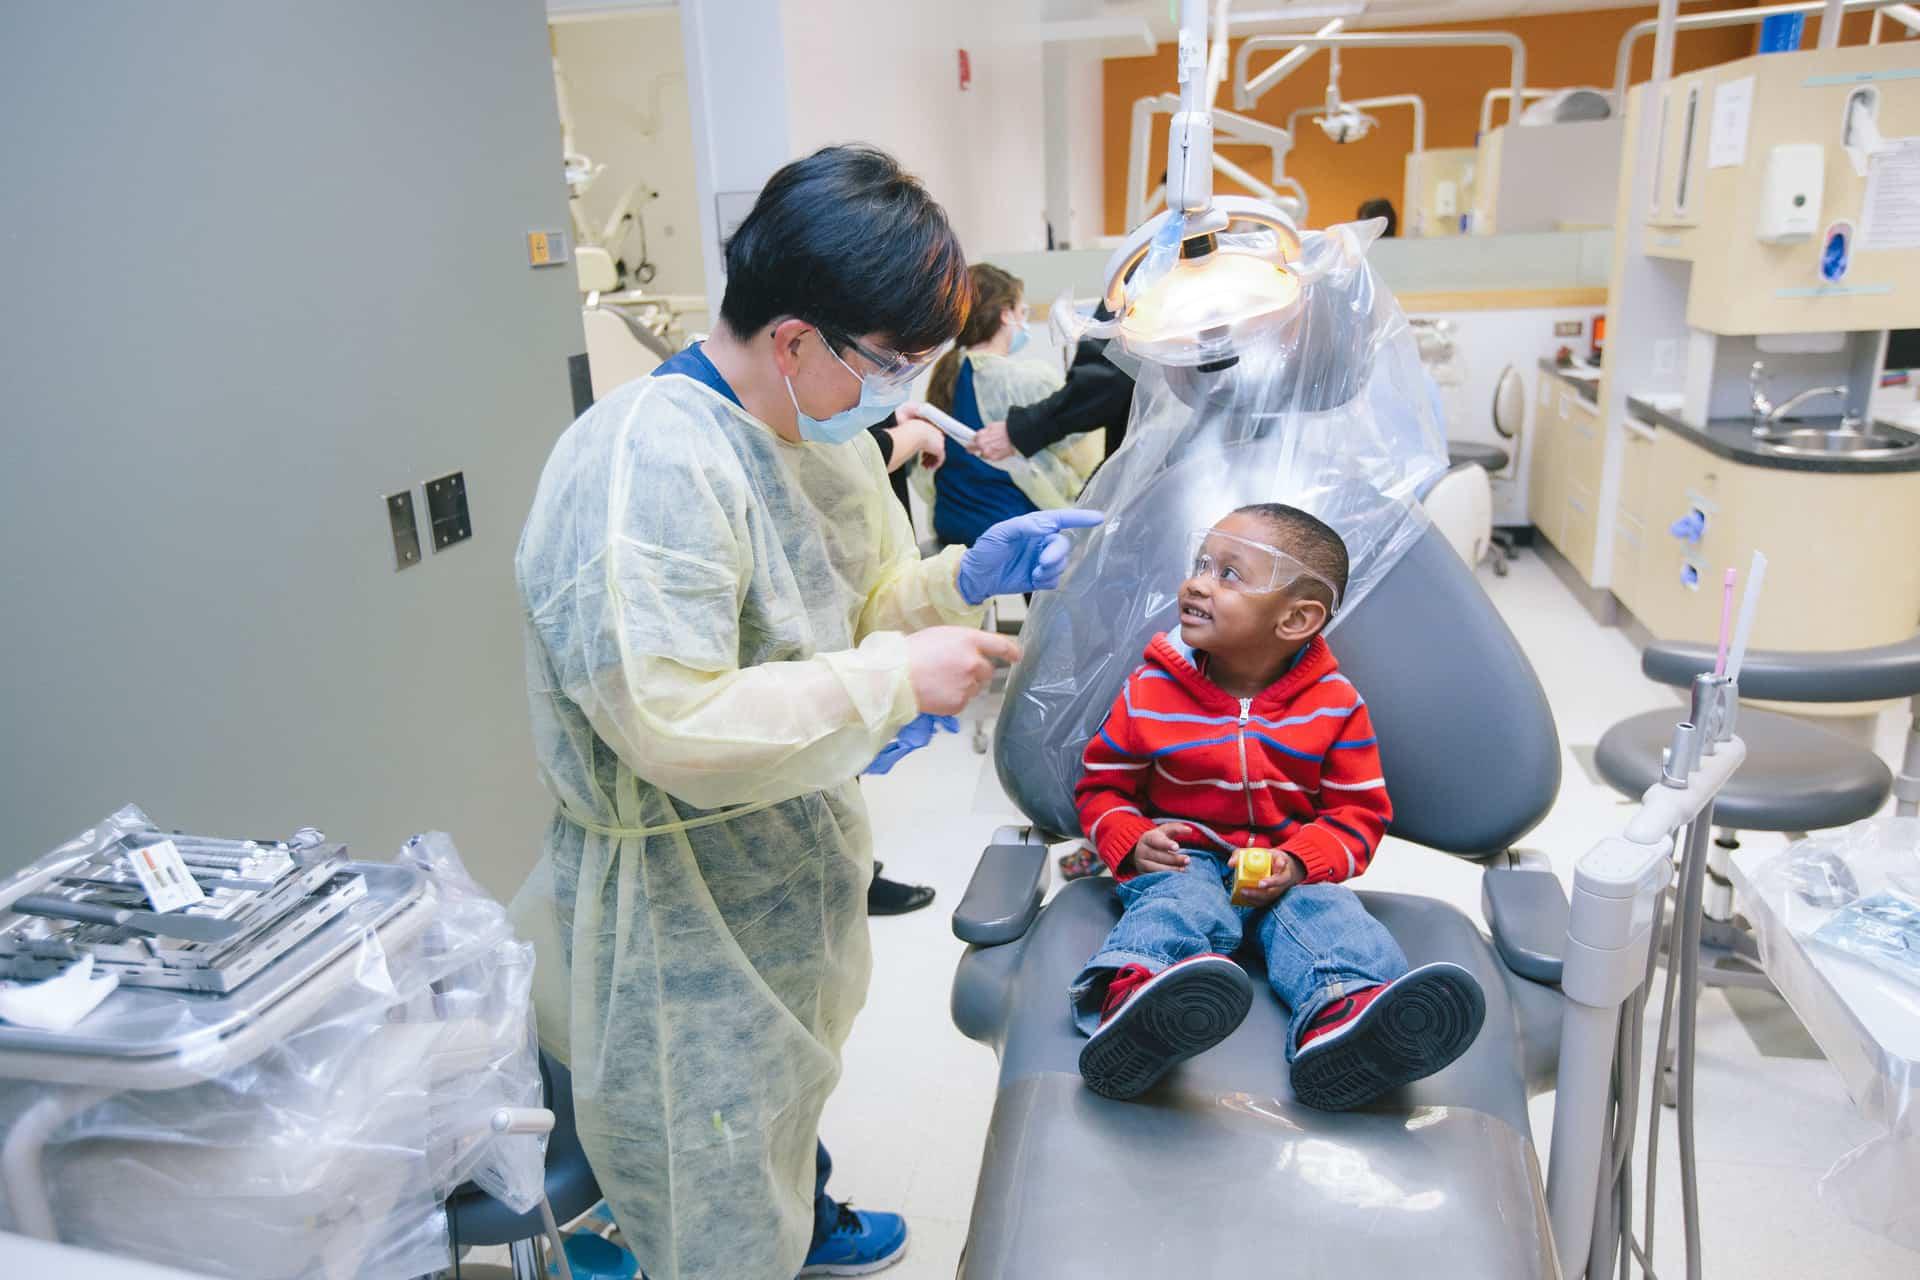 Quality Patient Focused Care Services